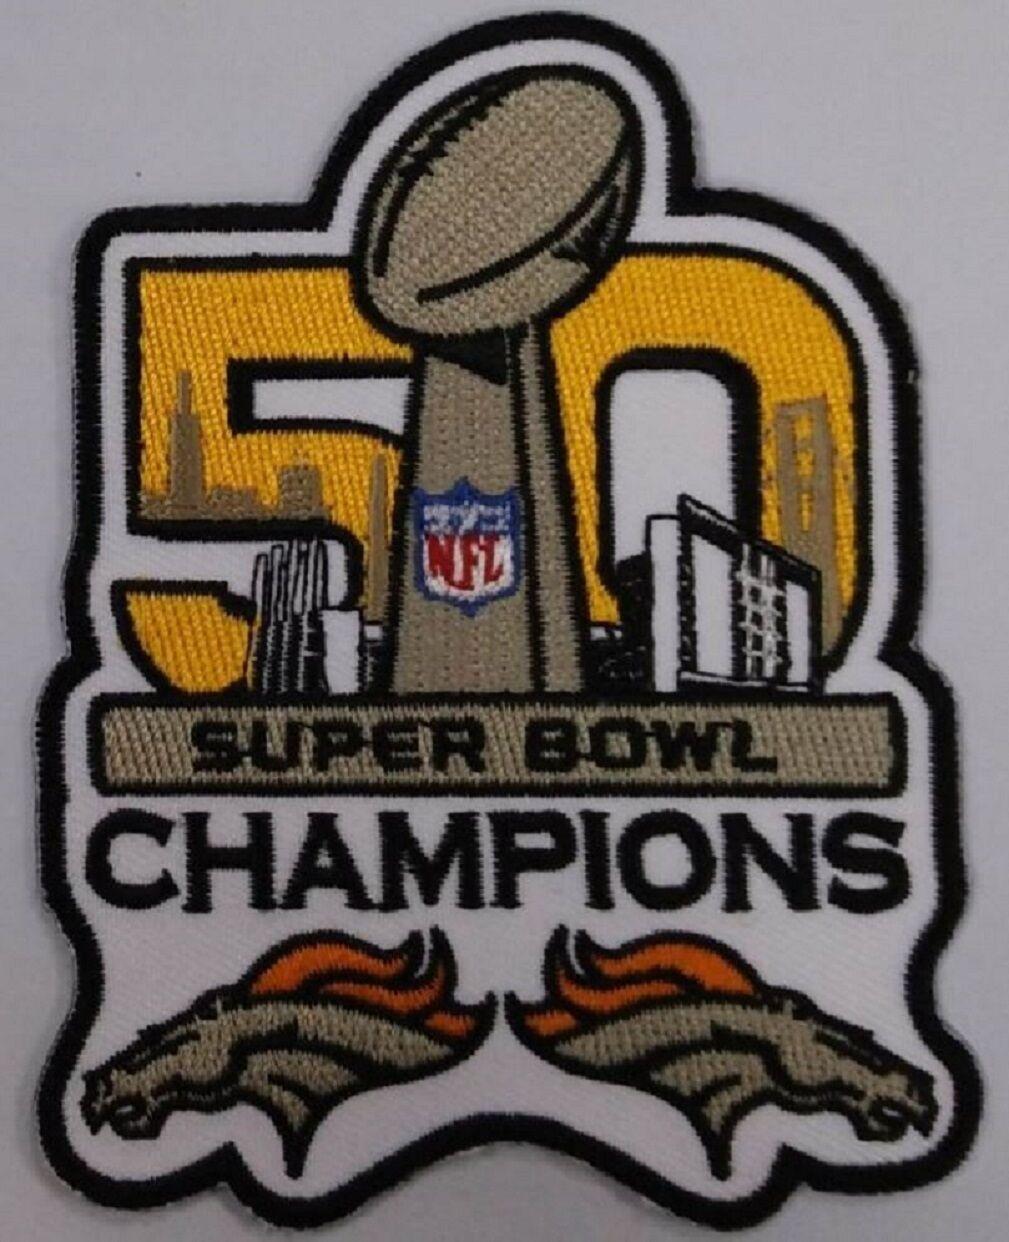 Iron Bowl Champs 2017 >> $6.49 SUPER BOWL 50 DENVER BRONCOS CHAMPIONSHIP PATCH 2016 NFL SUPERBOWL CHAMPS | eBay